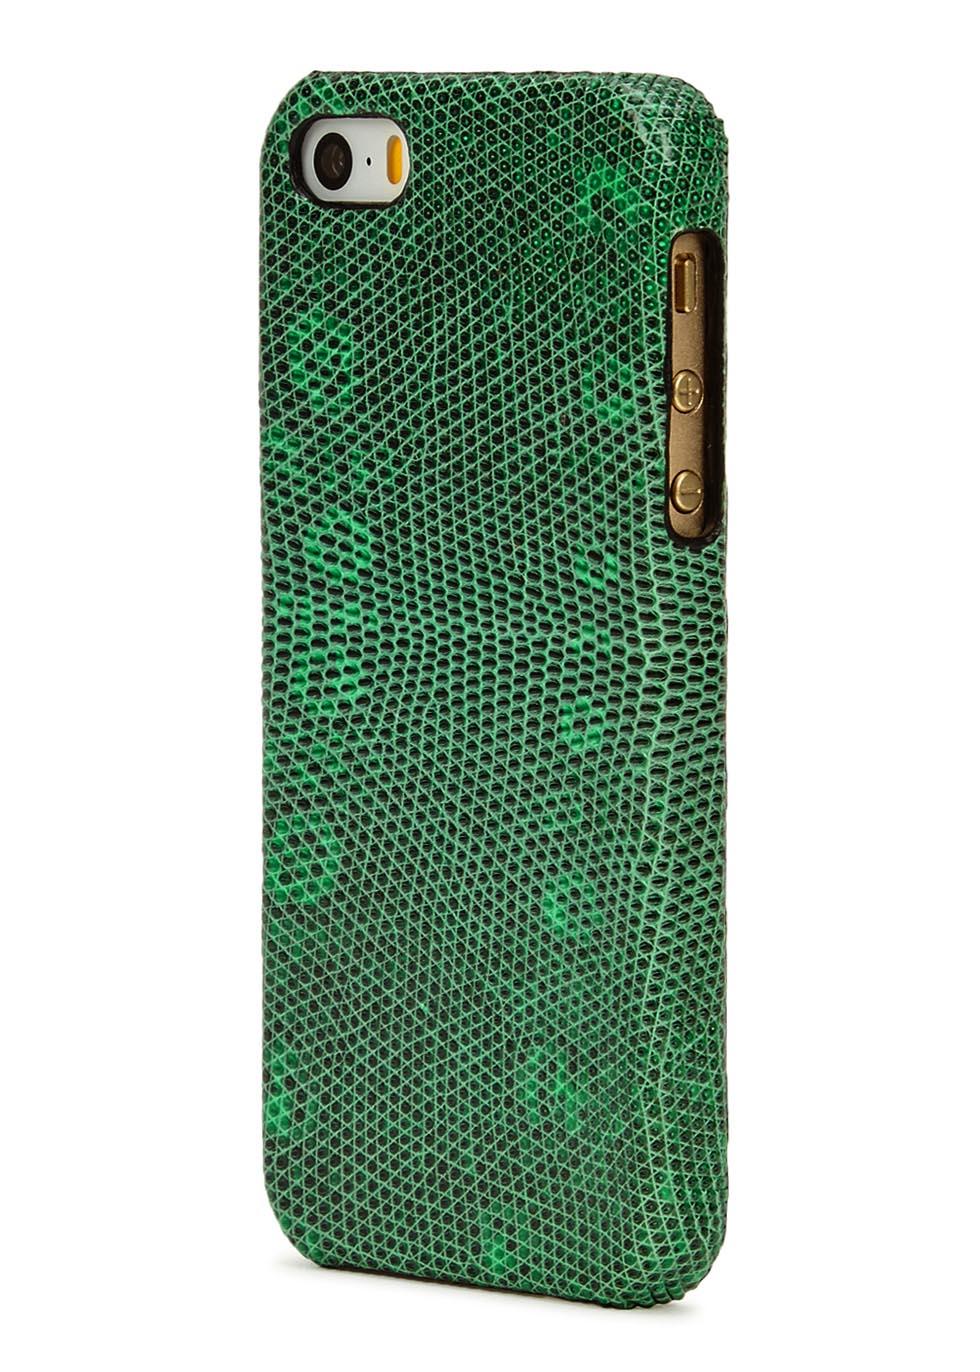 Iguana-effect leather iPhone 5/5S/SE case - The Case Factory